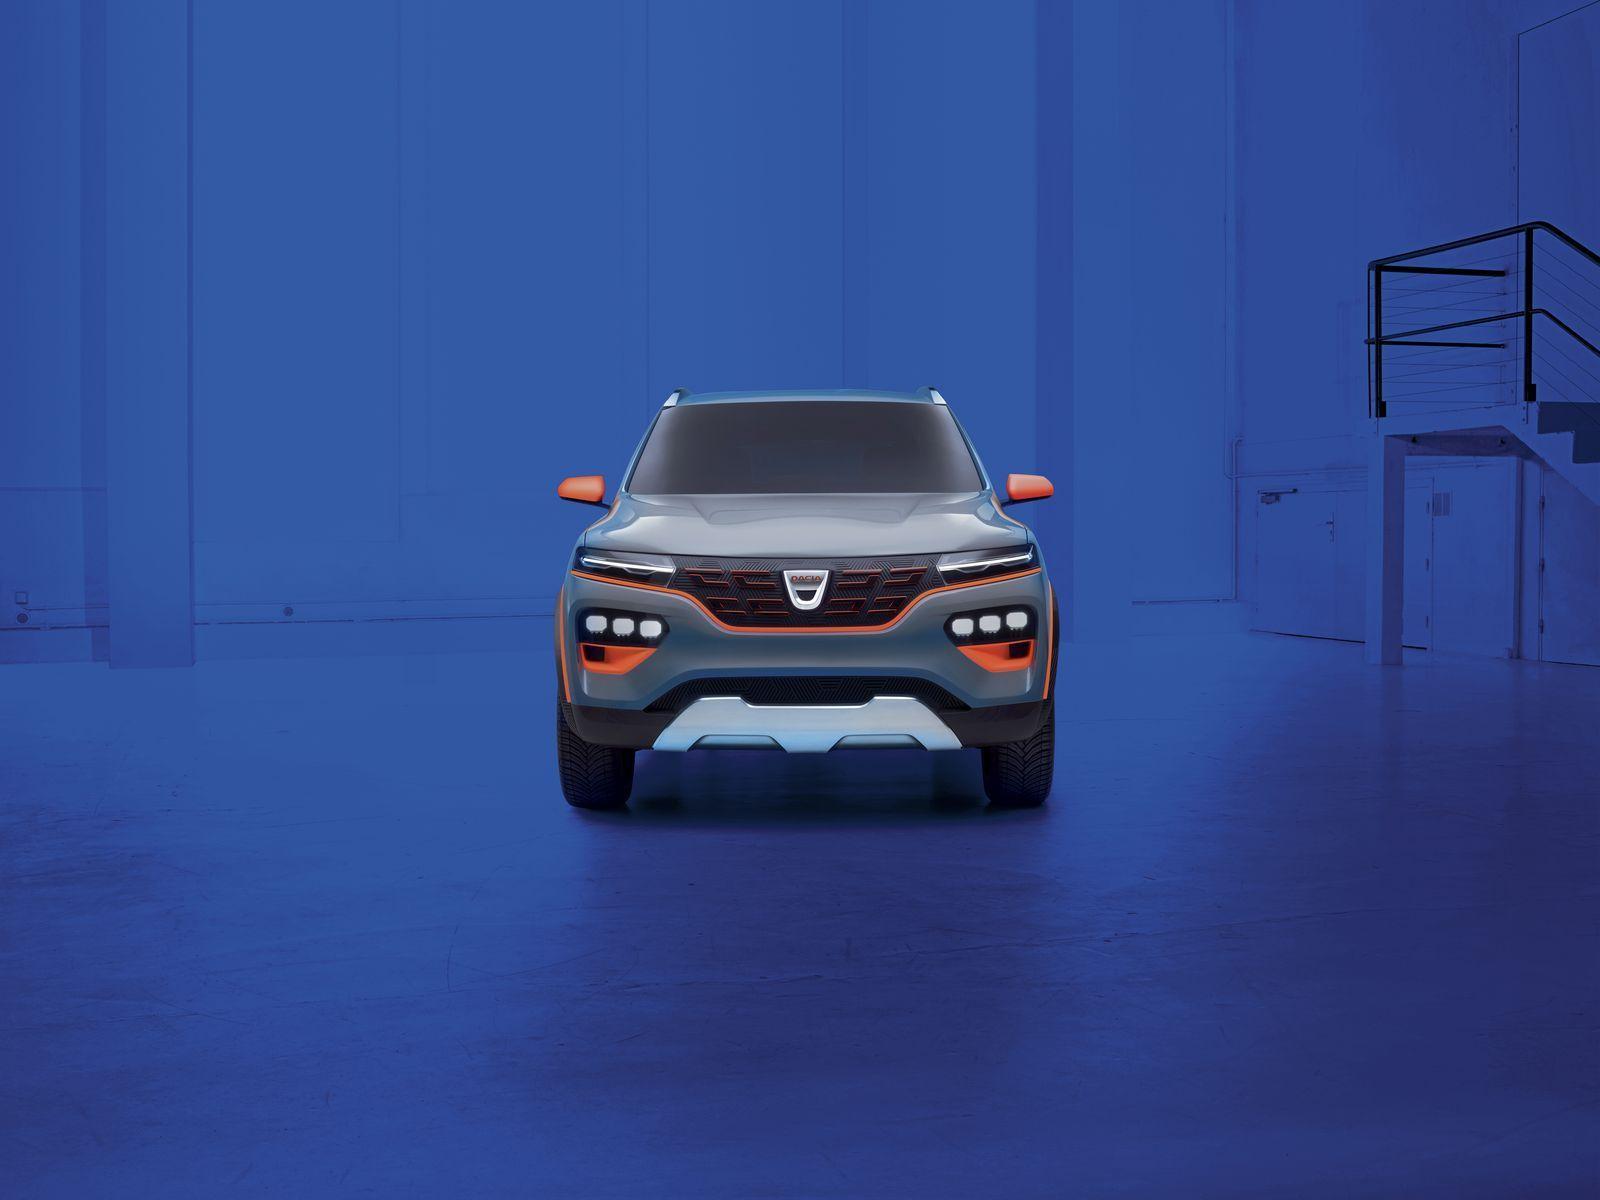 DaciaSpring_Concept_AutoRok_2020_06